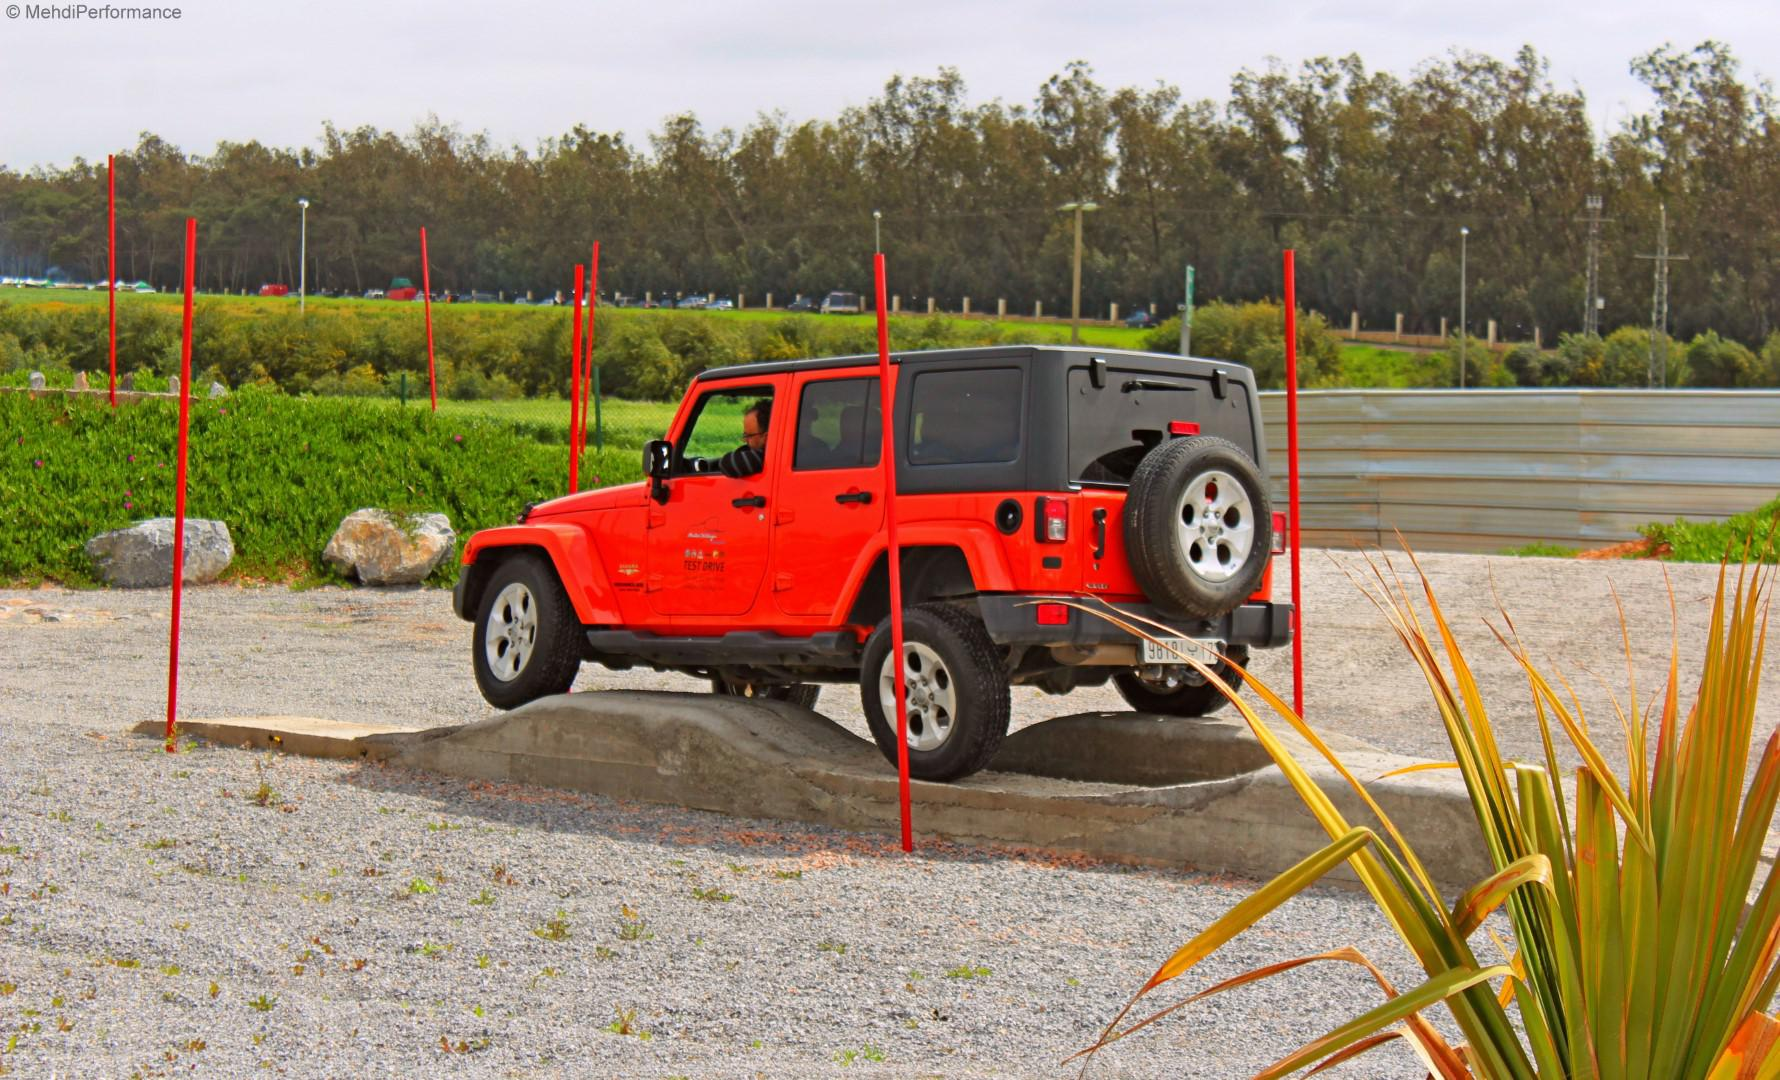 jeep-territory-le-nouveau-terrain-de-jeu-by-motor-village-716-5.jpg